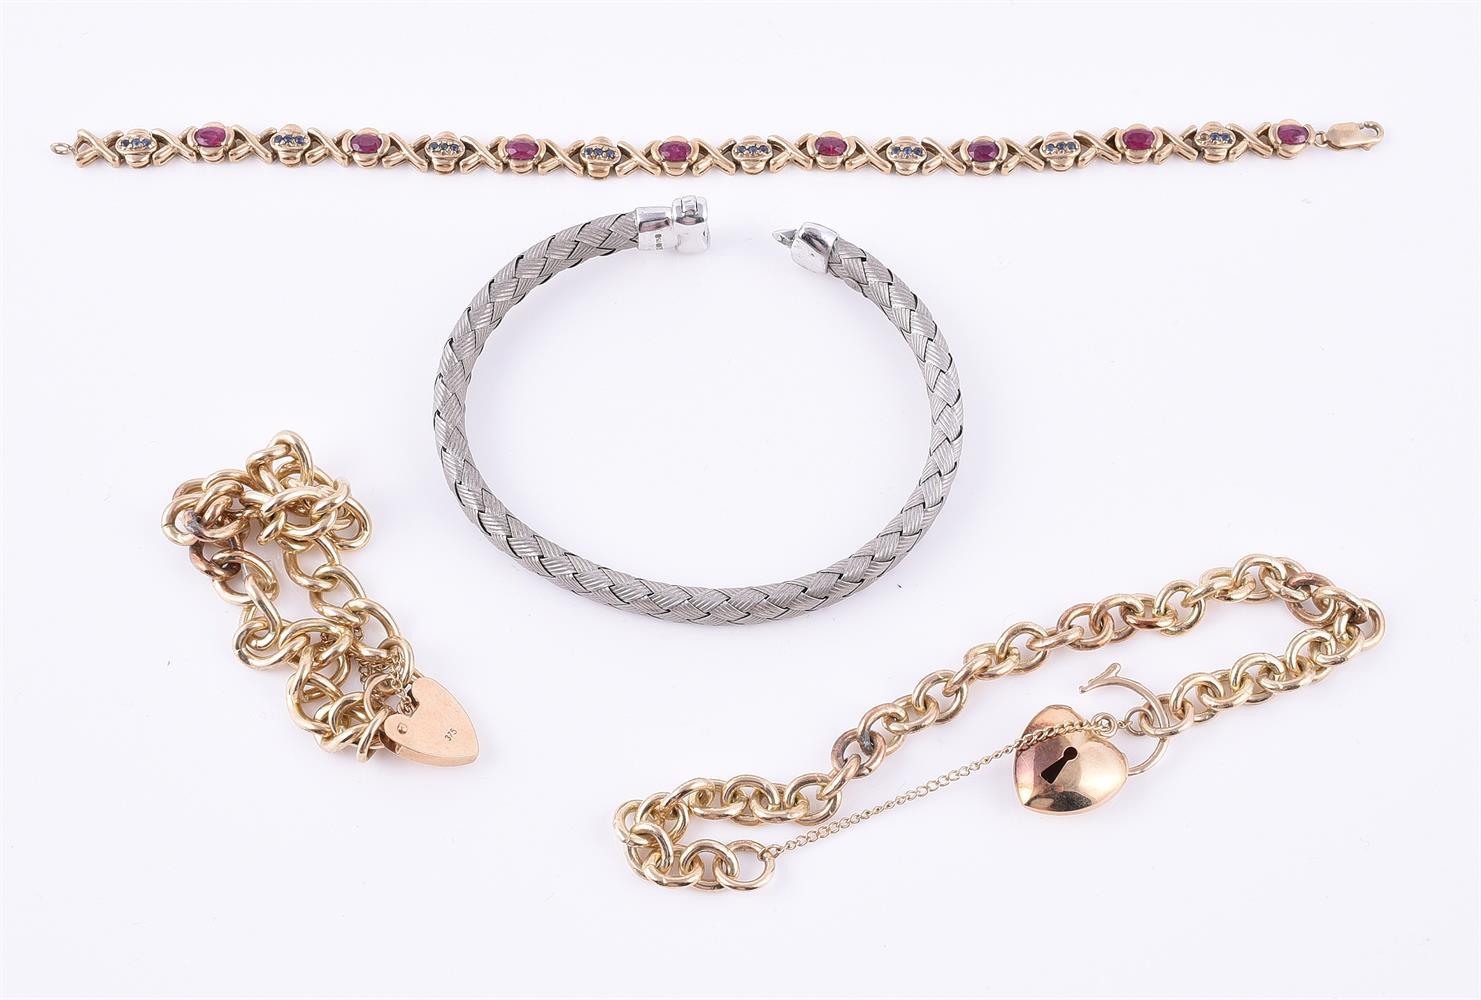 A 9 carat gold woven bracelet